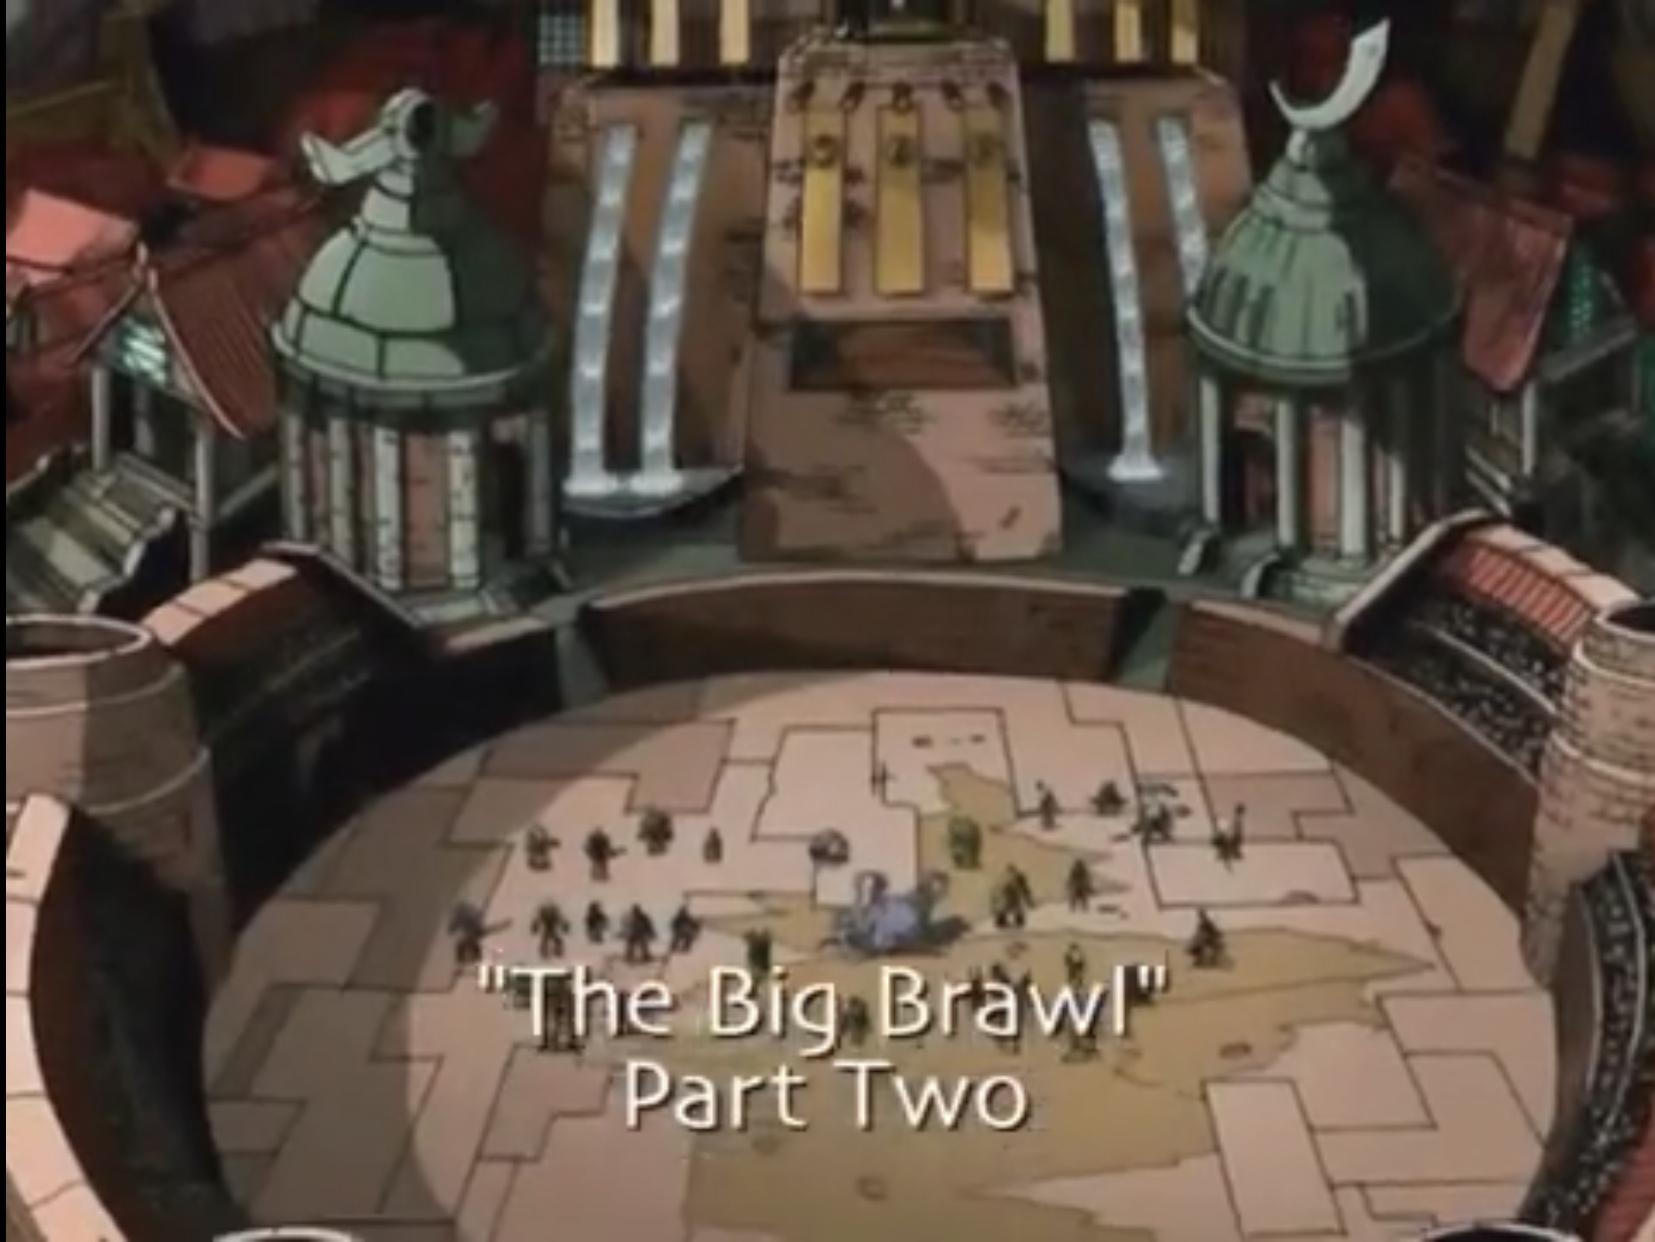 The Big Brawl, Part 2